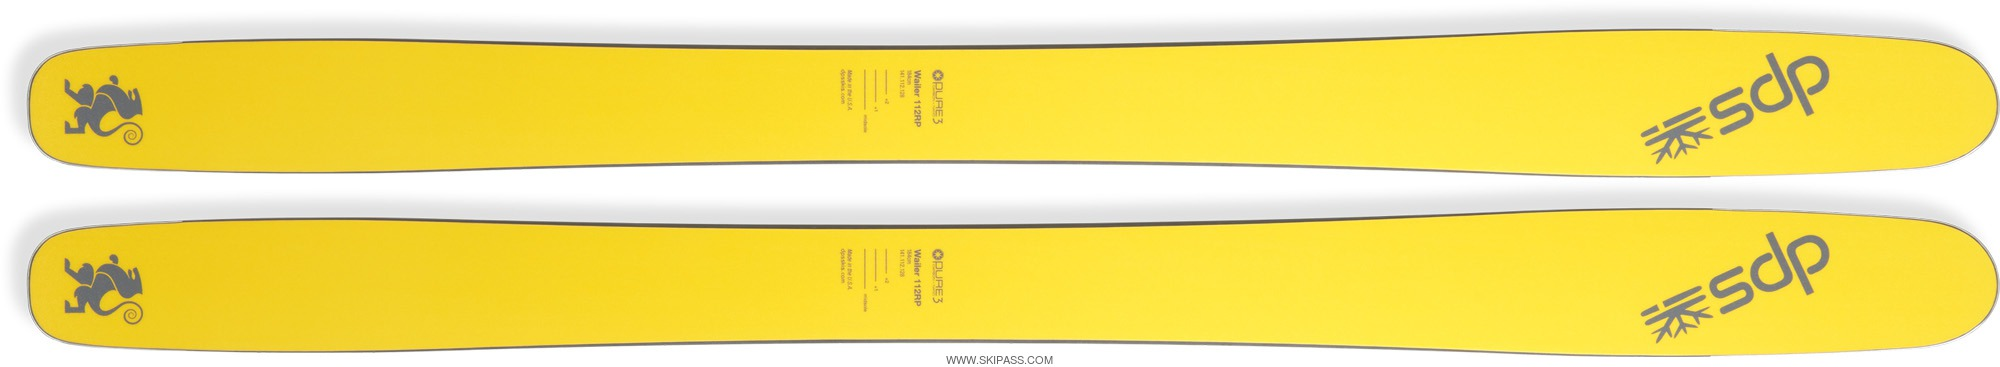 DPS wailer 112 rp 2.0 pure3